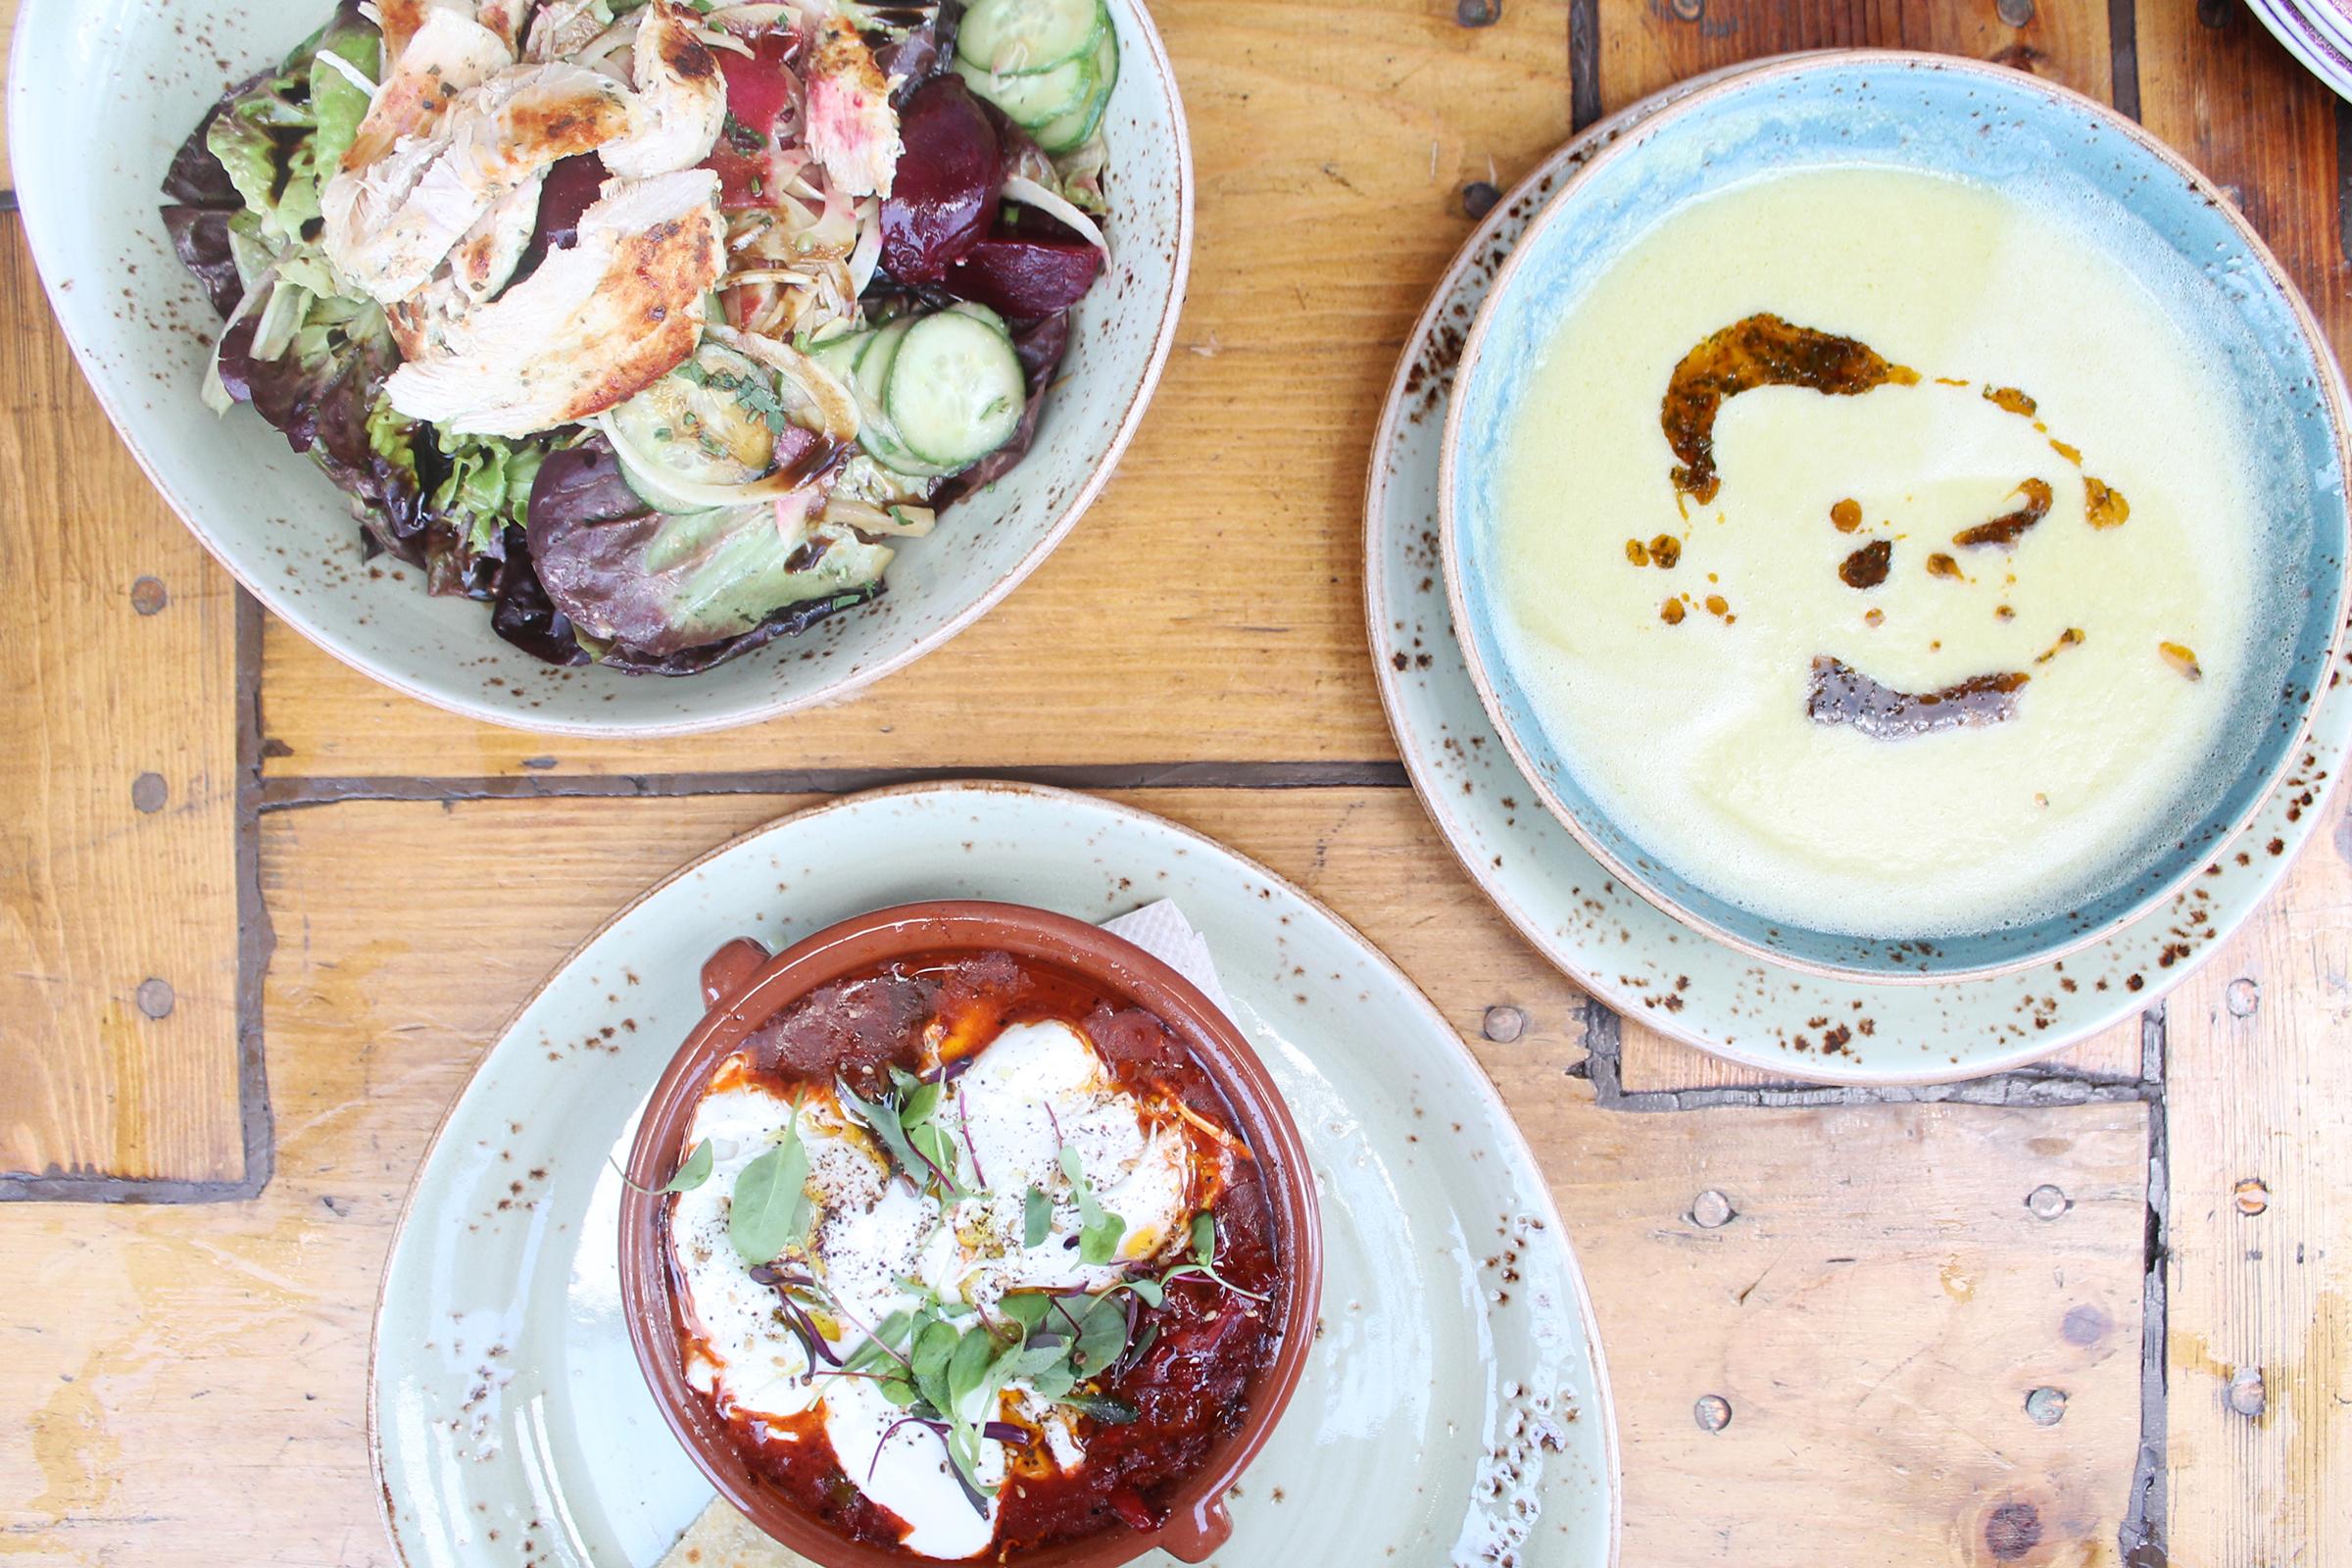 Rosemary Chicken Salad, Shakshuka, and Buttermilk Fried Chicken